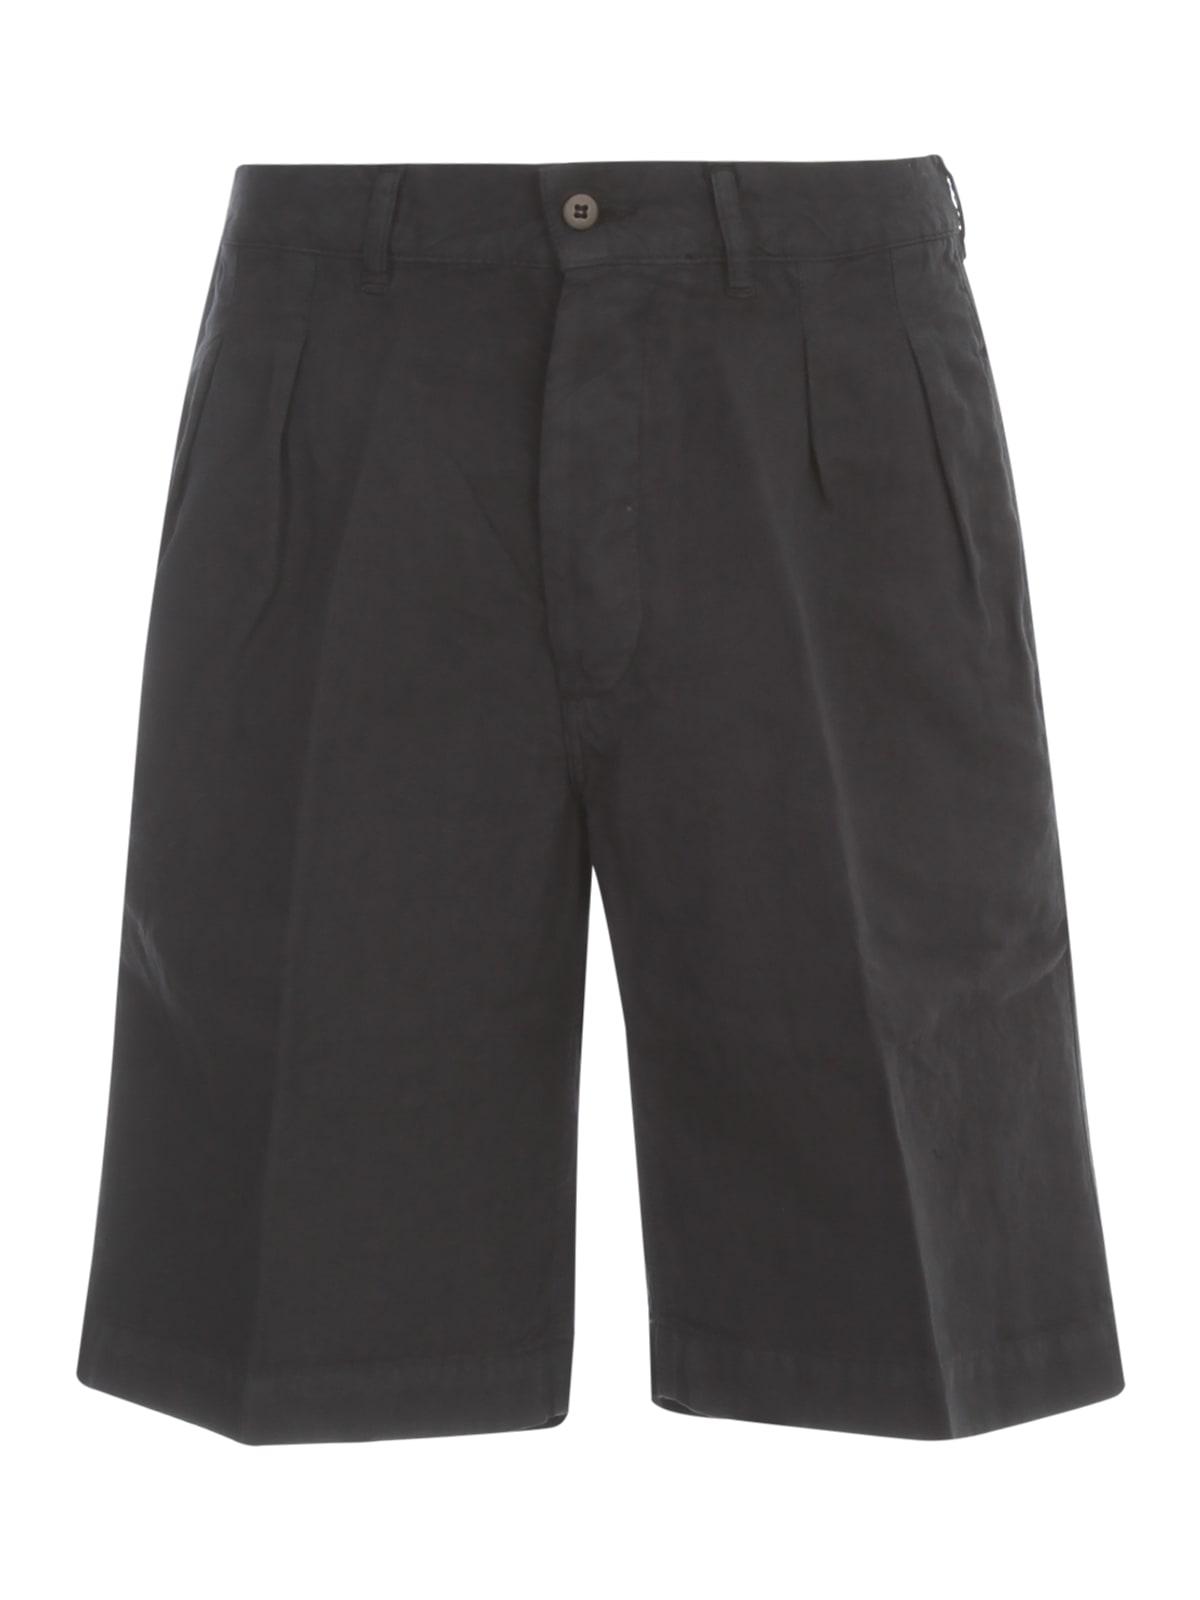 Pants W/pence